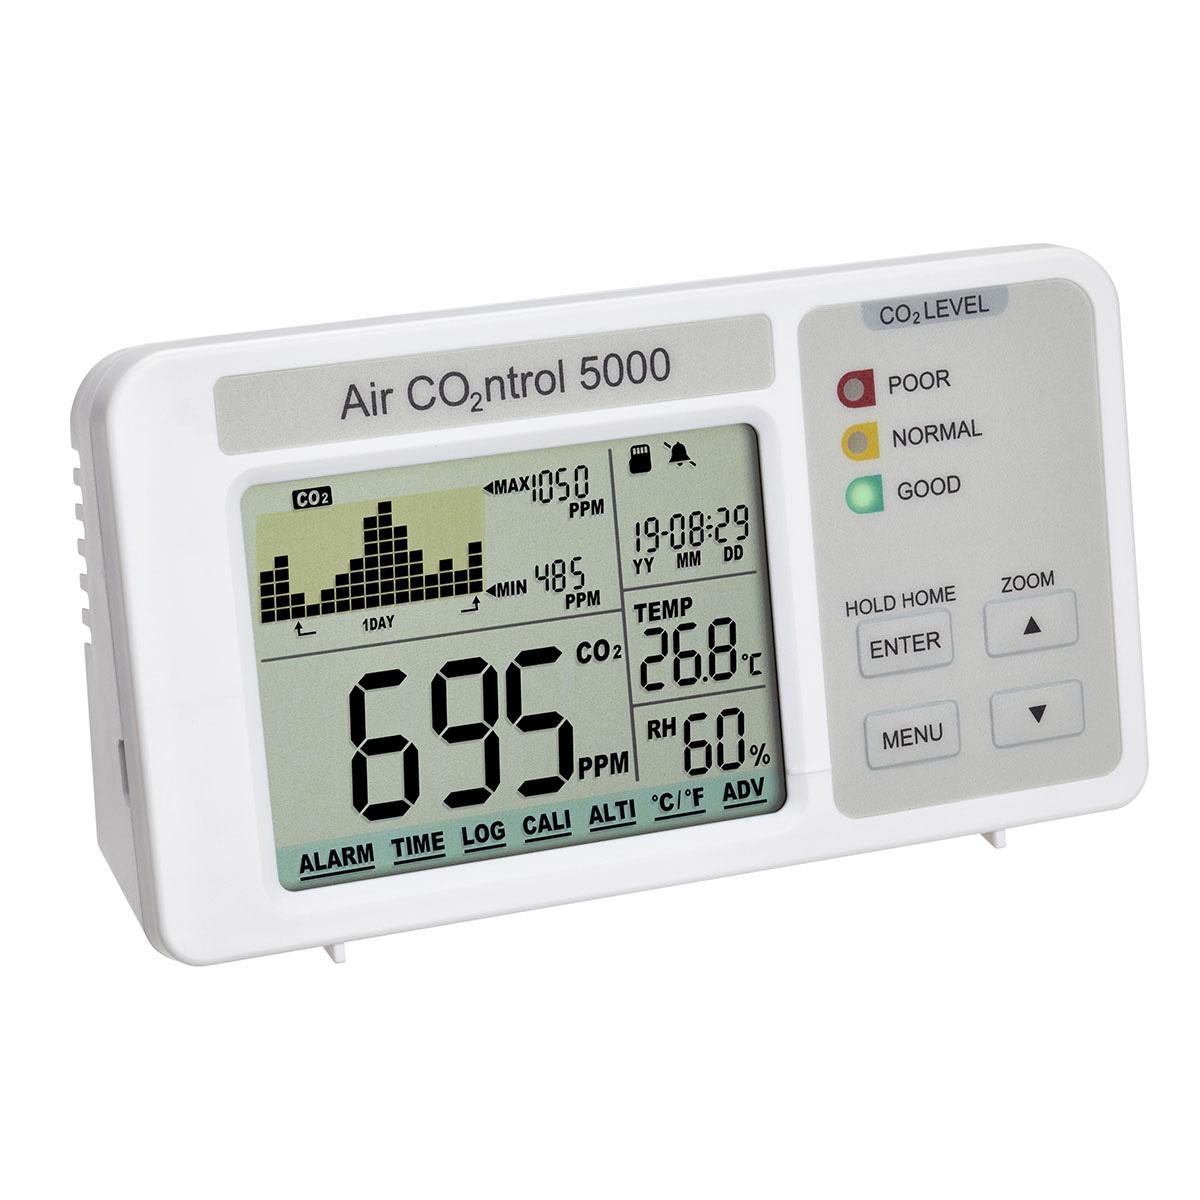 31-5008-02-co2-messgerät-mit-datenlogger-airco2ntrol-5000-1200x1200px.jpg